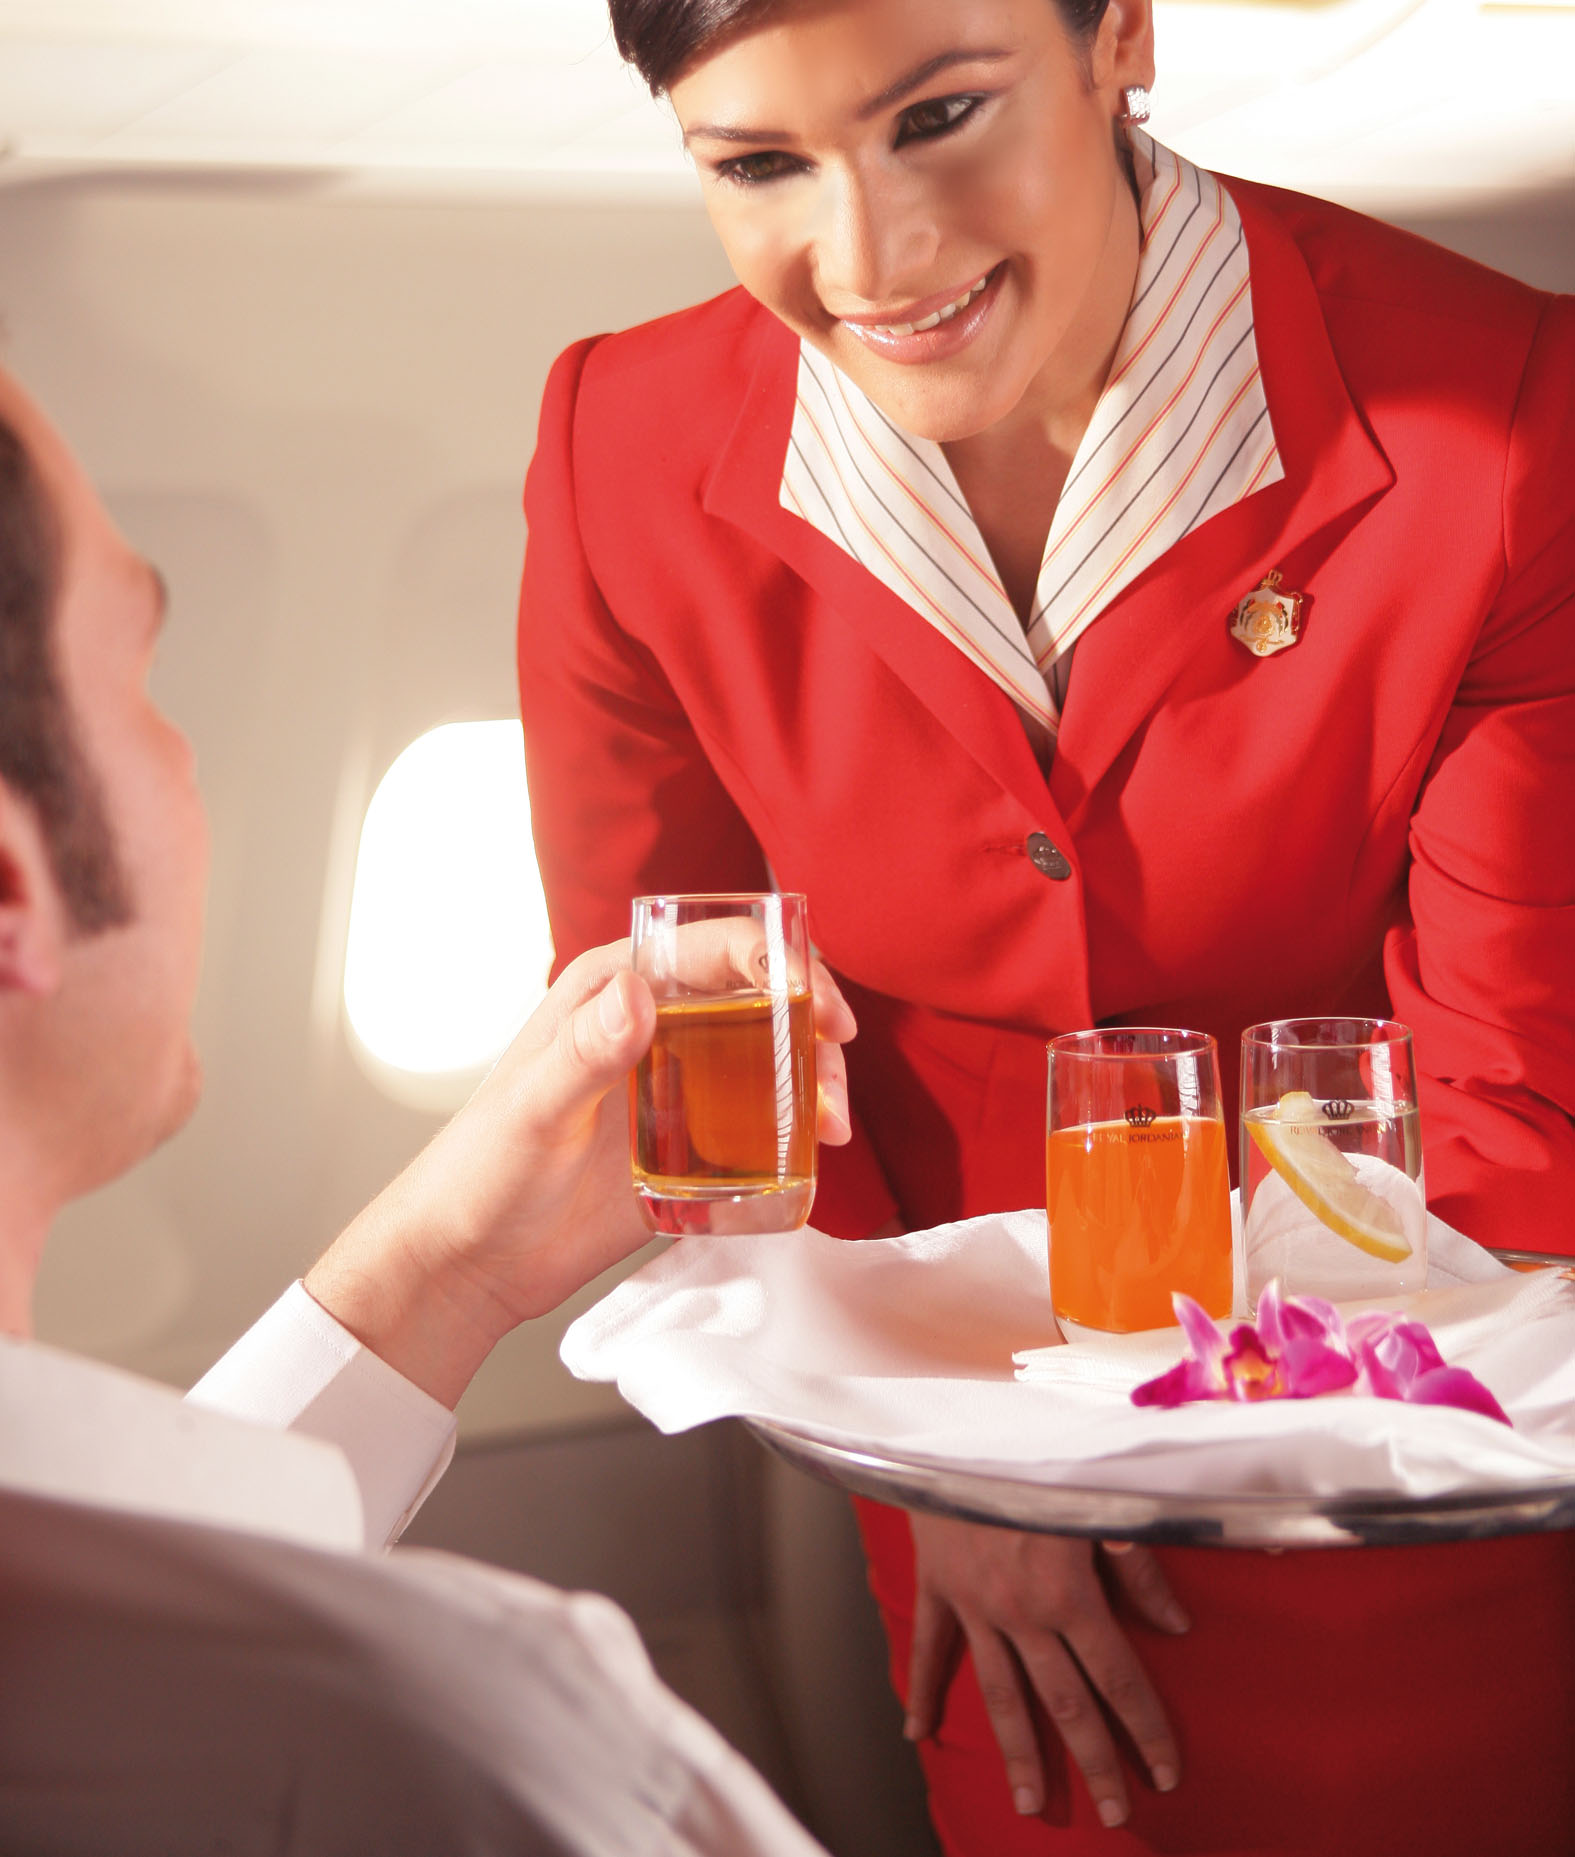 Royal Fashion Beauty Champagner 45131 Essen: Royal Jordanian Ab Deutschland, Royal Jordanian Airlines